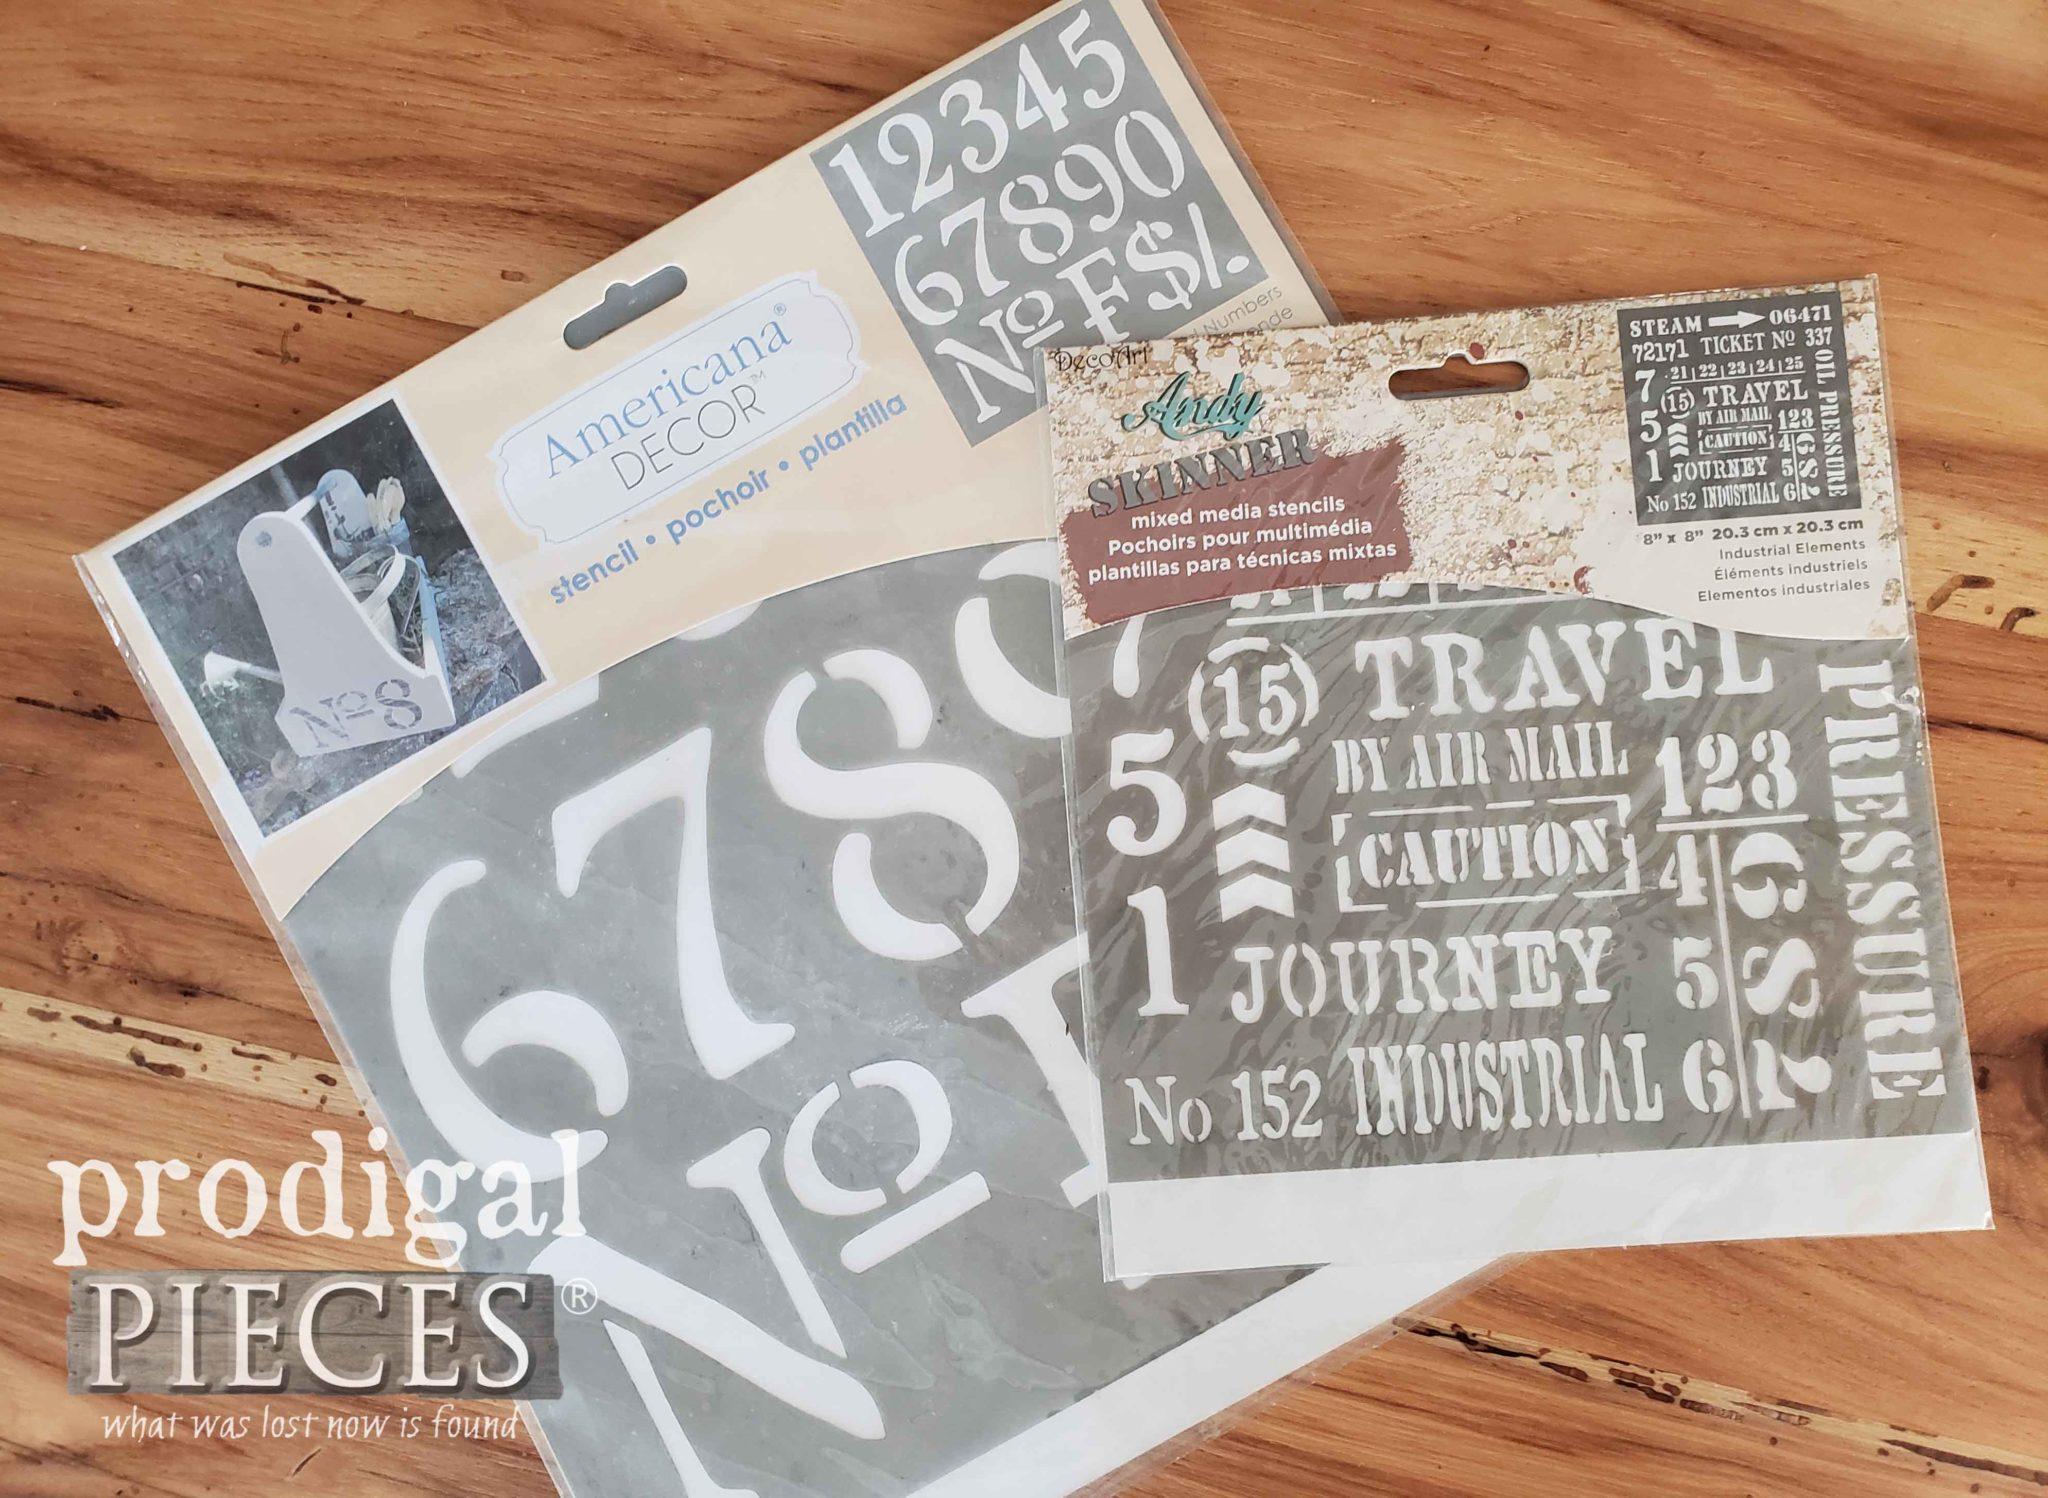 DecoArt Stencils for Farmhouse Decor by Prodigal Pieces | prodigalpieces.com